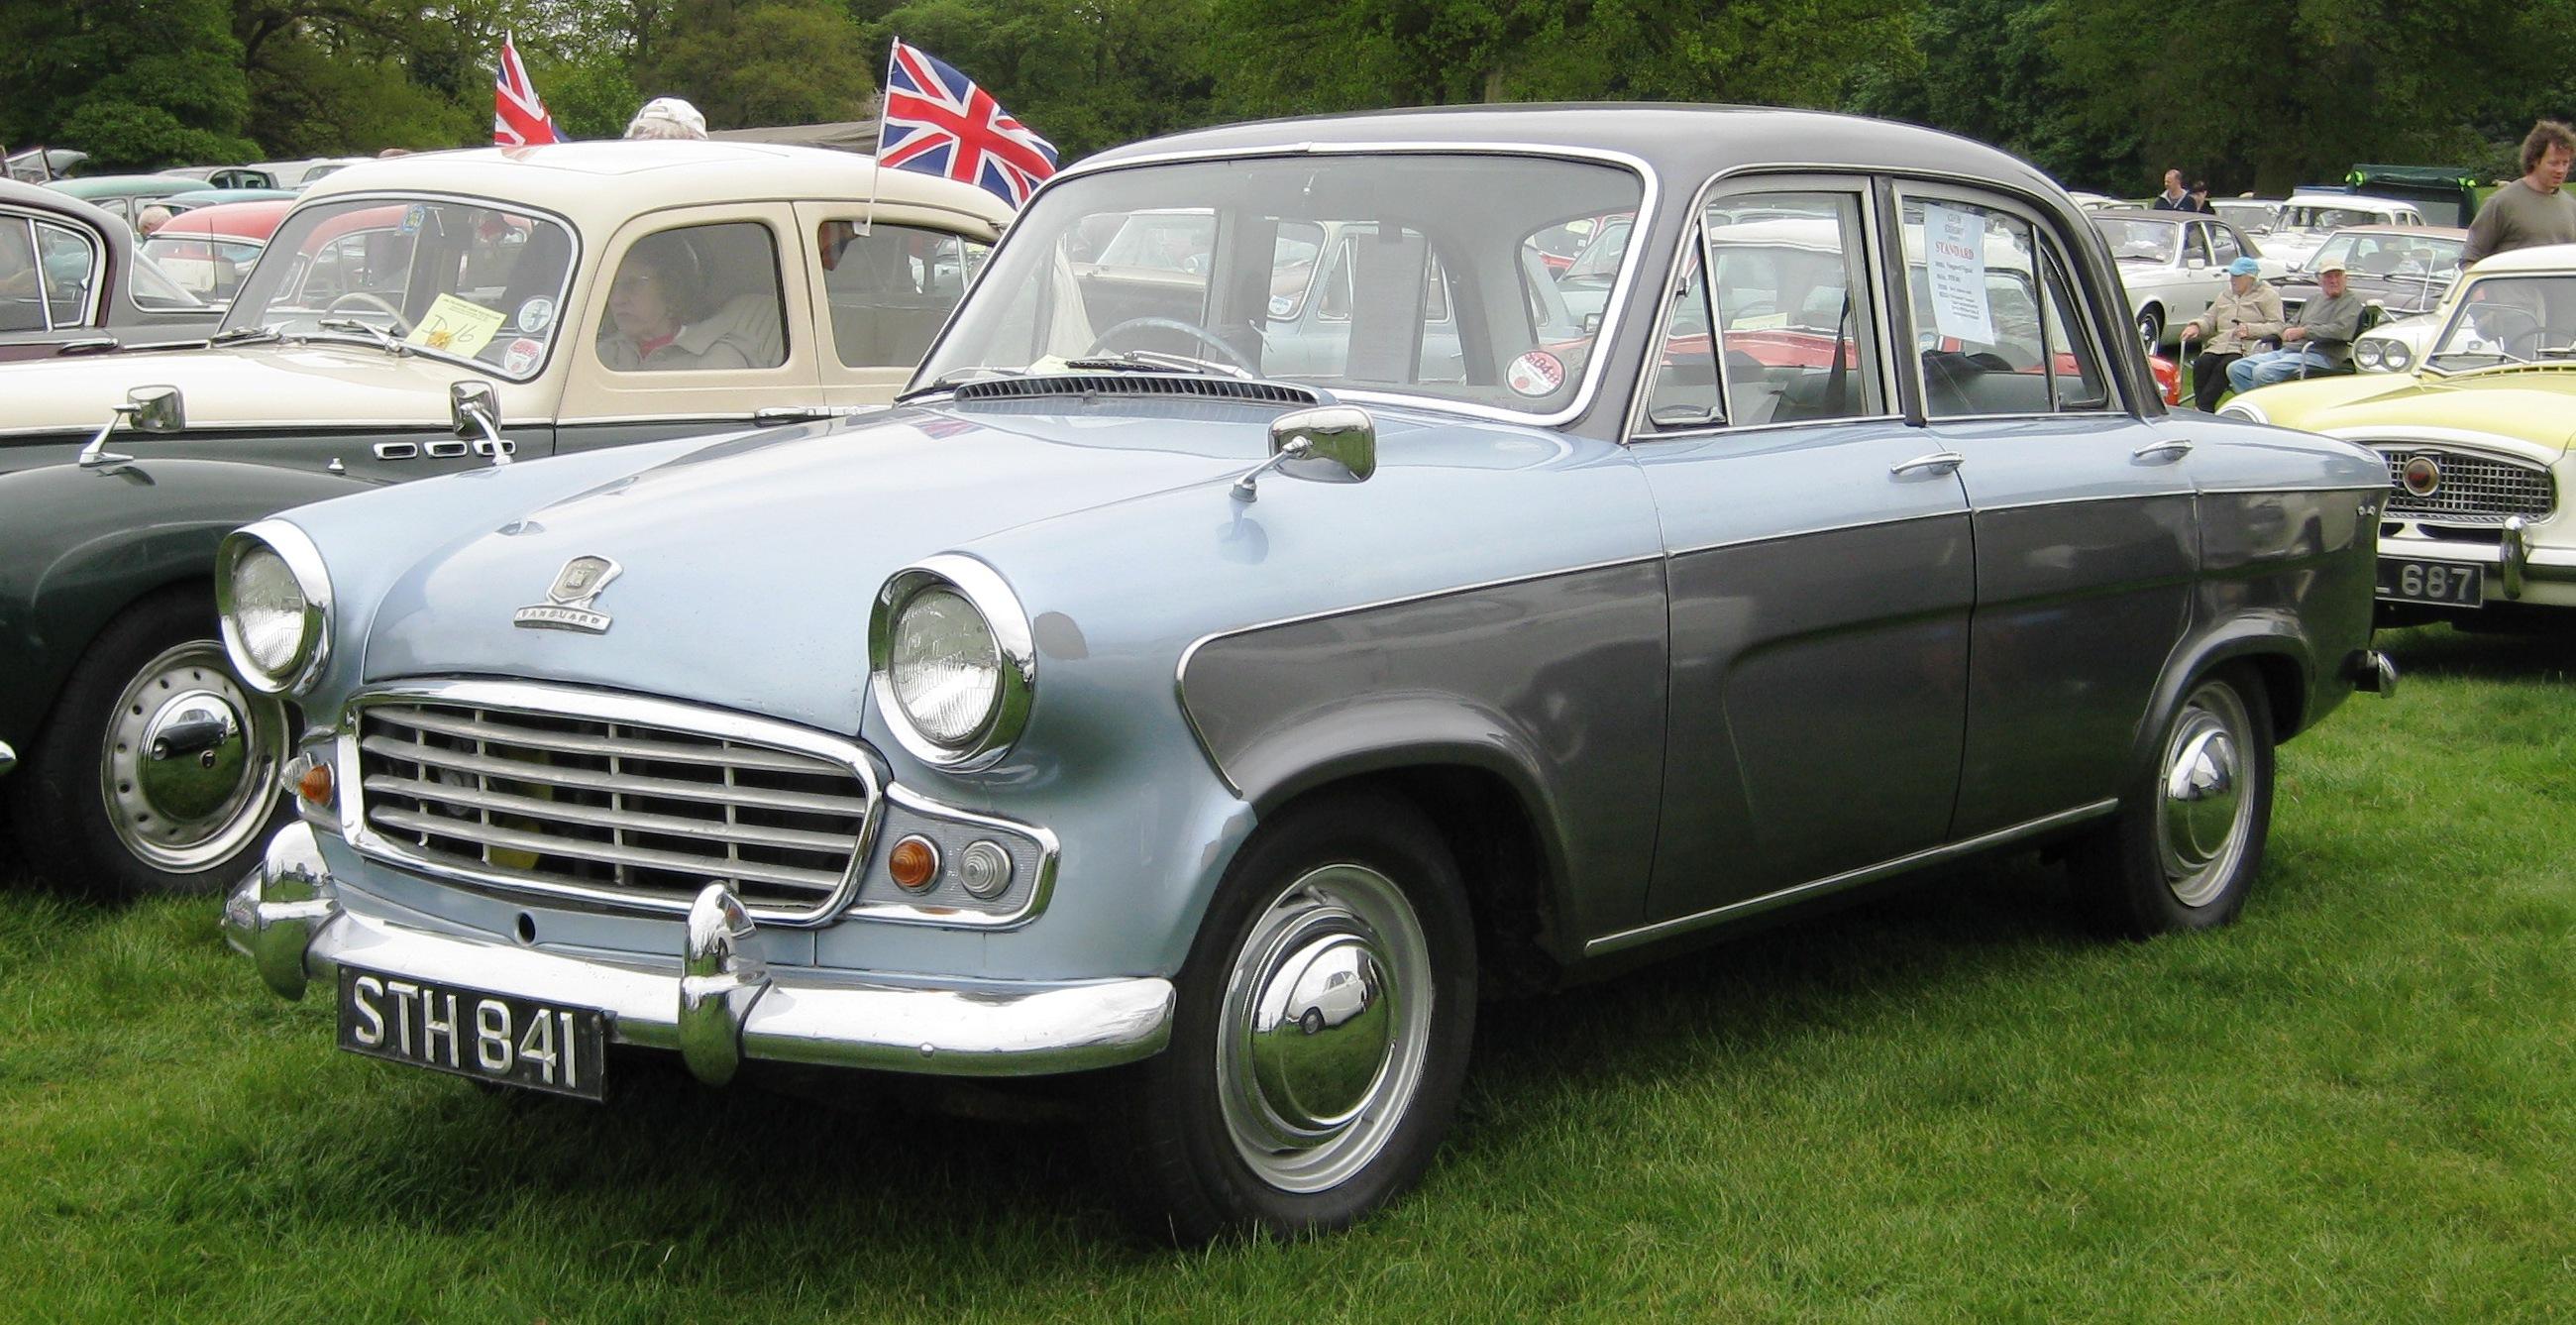 File:Standard Vanguard Vignale 1959 2080cc.JPG - Wikimedia Commons